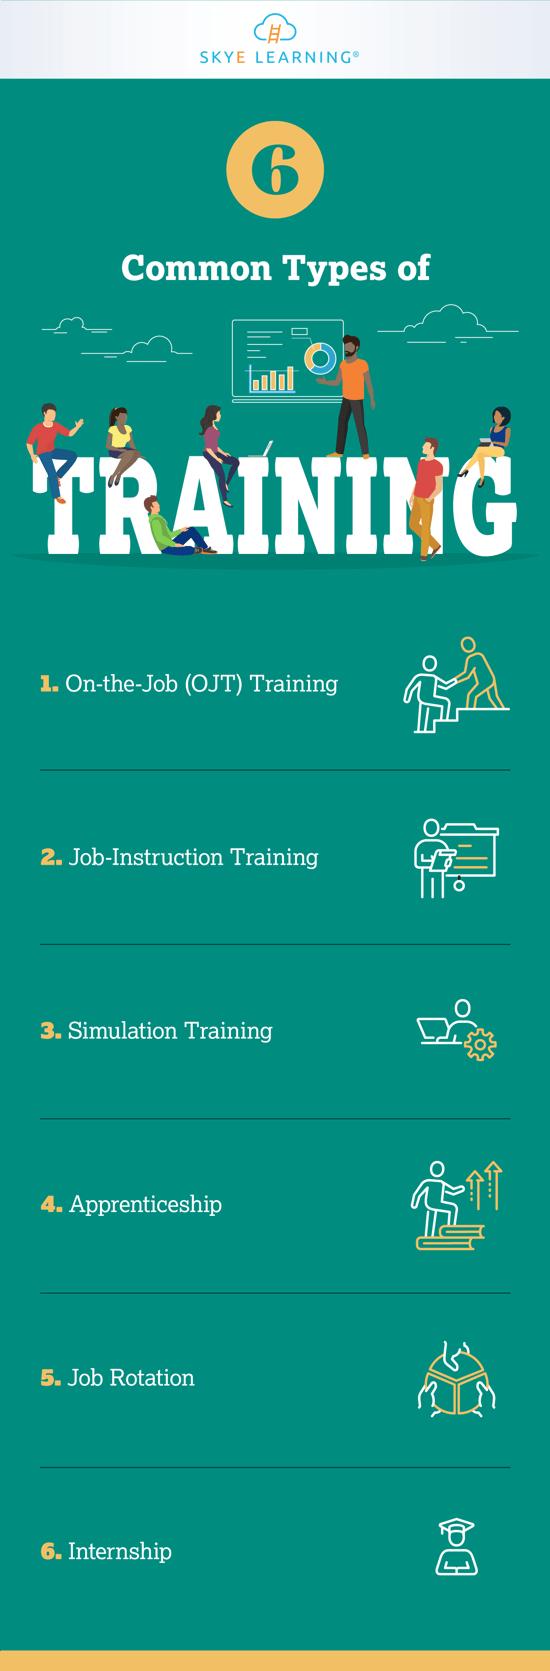 six_common_types_of_training_infographic_SL